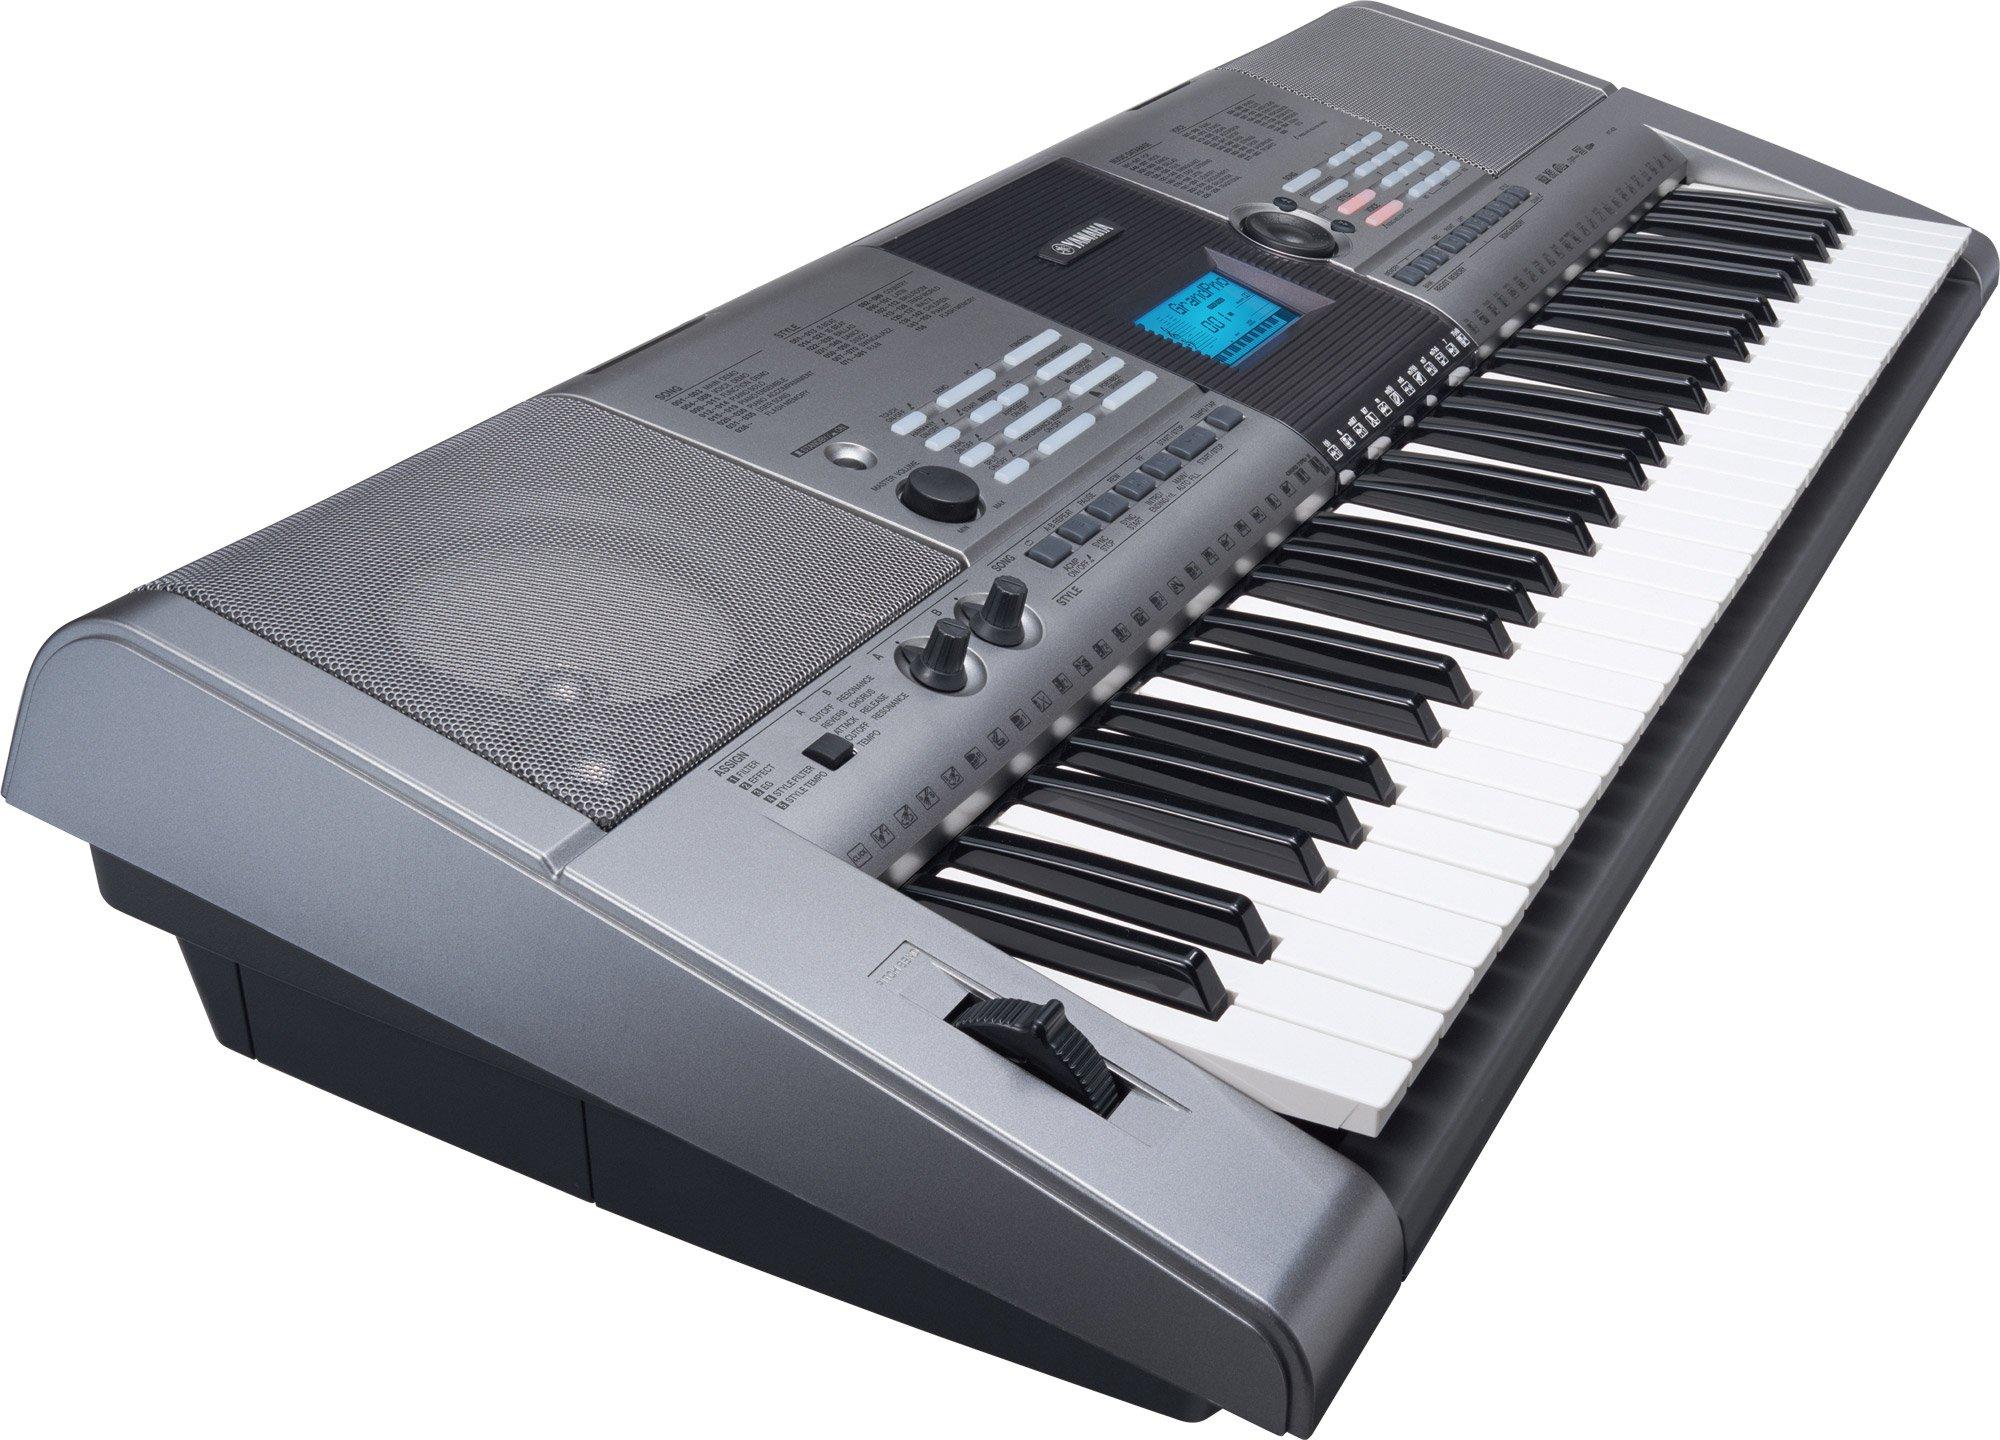 Image Result For Yamaha Keyboard Or